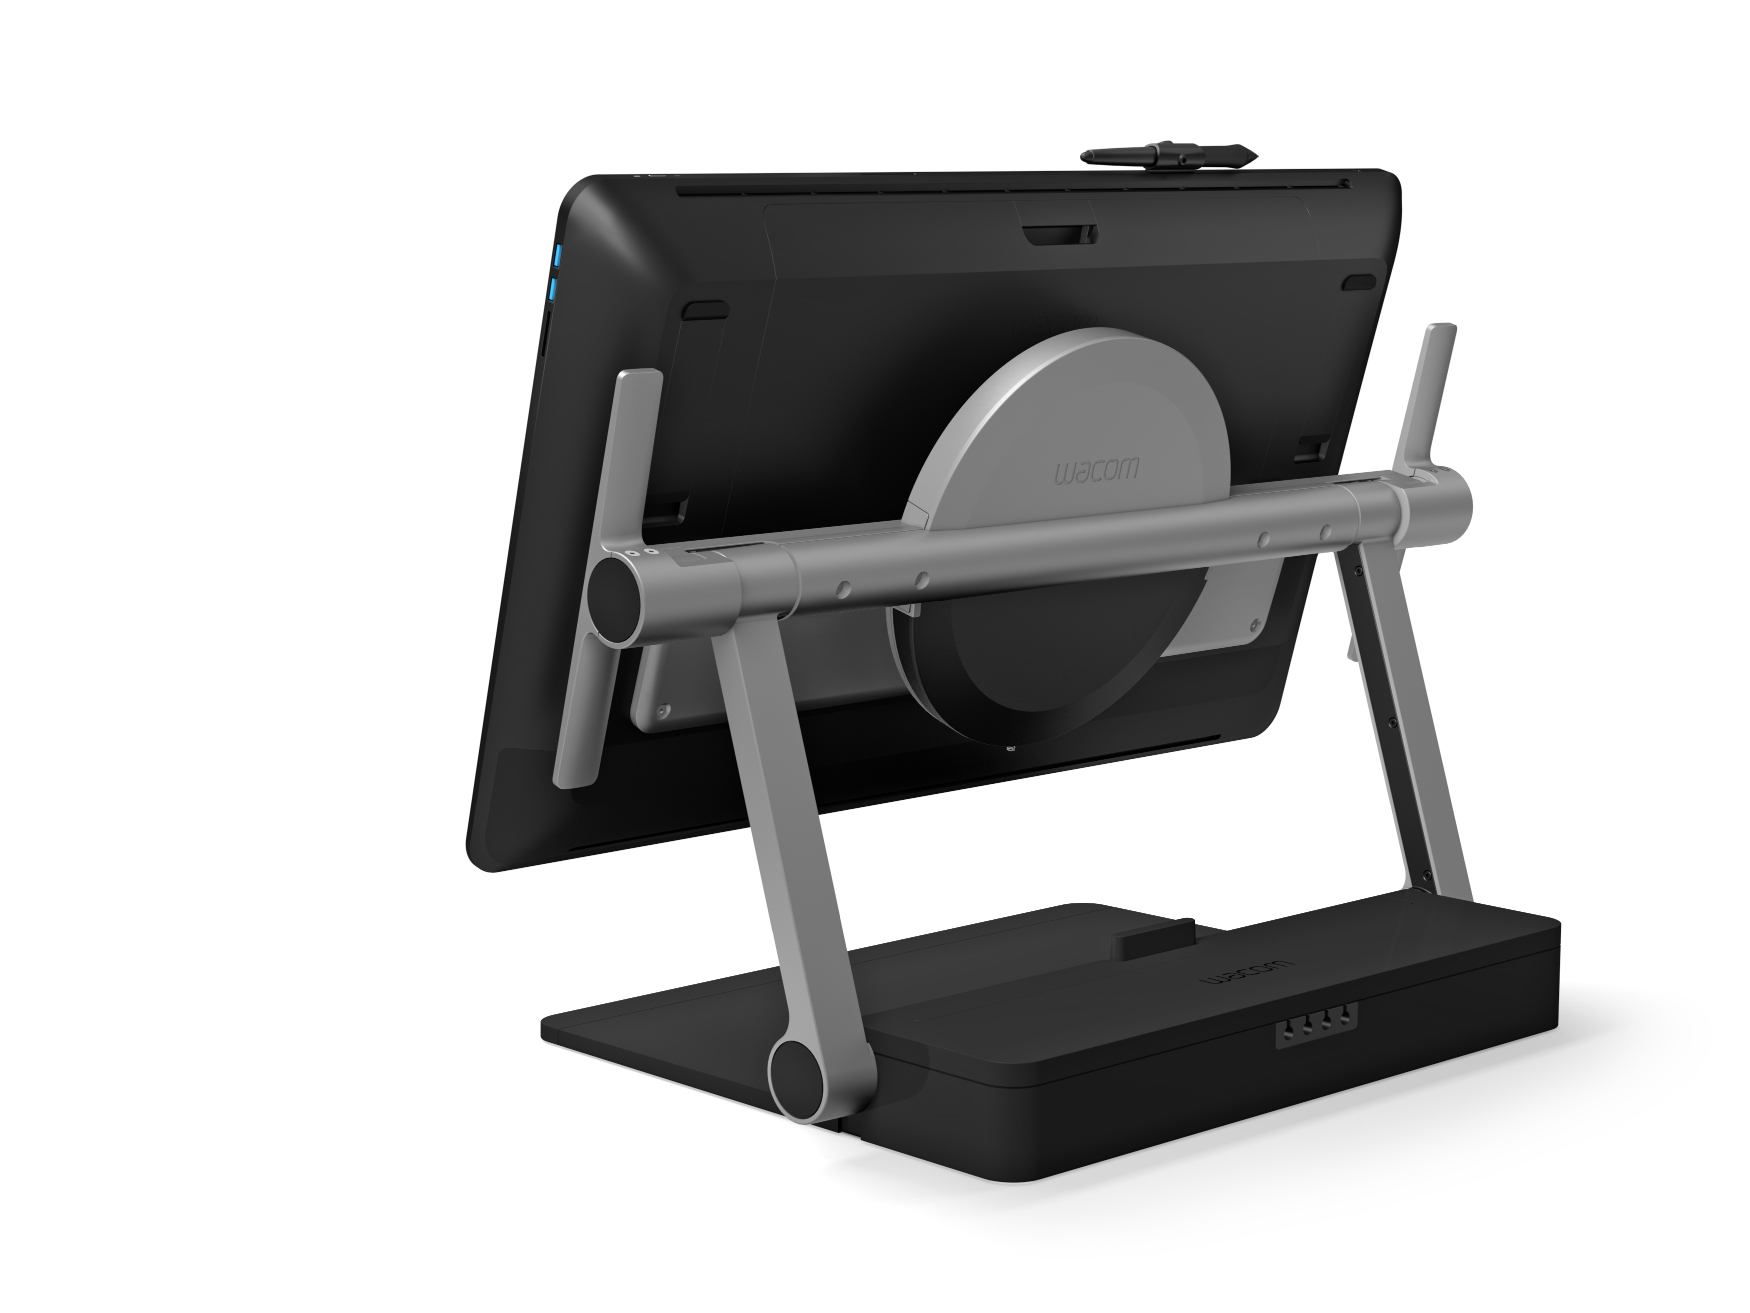 4498327-Wacom ACK62802K accessorio per tablet grafico Stand (CINTIQ PRO 32 ERGO